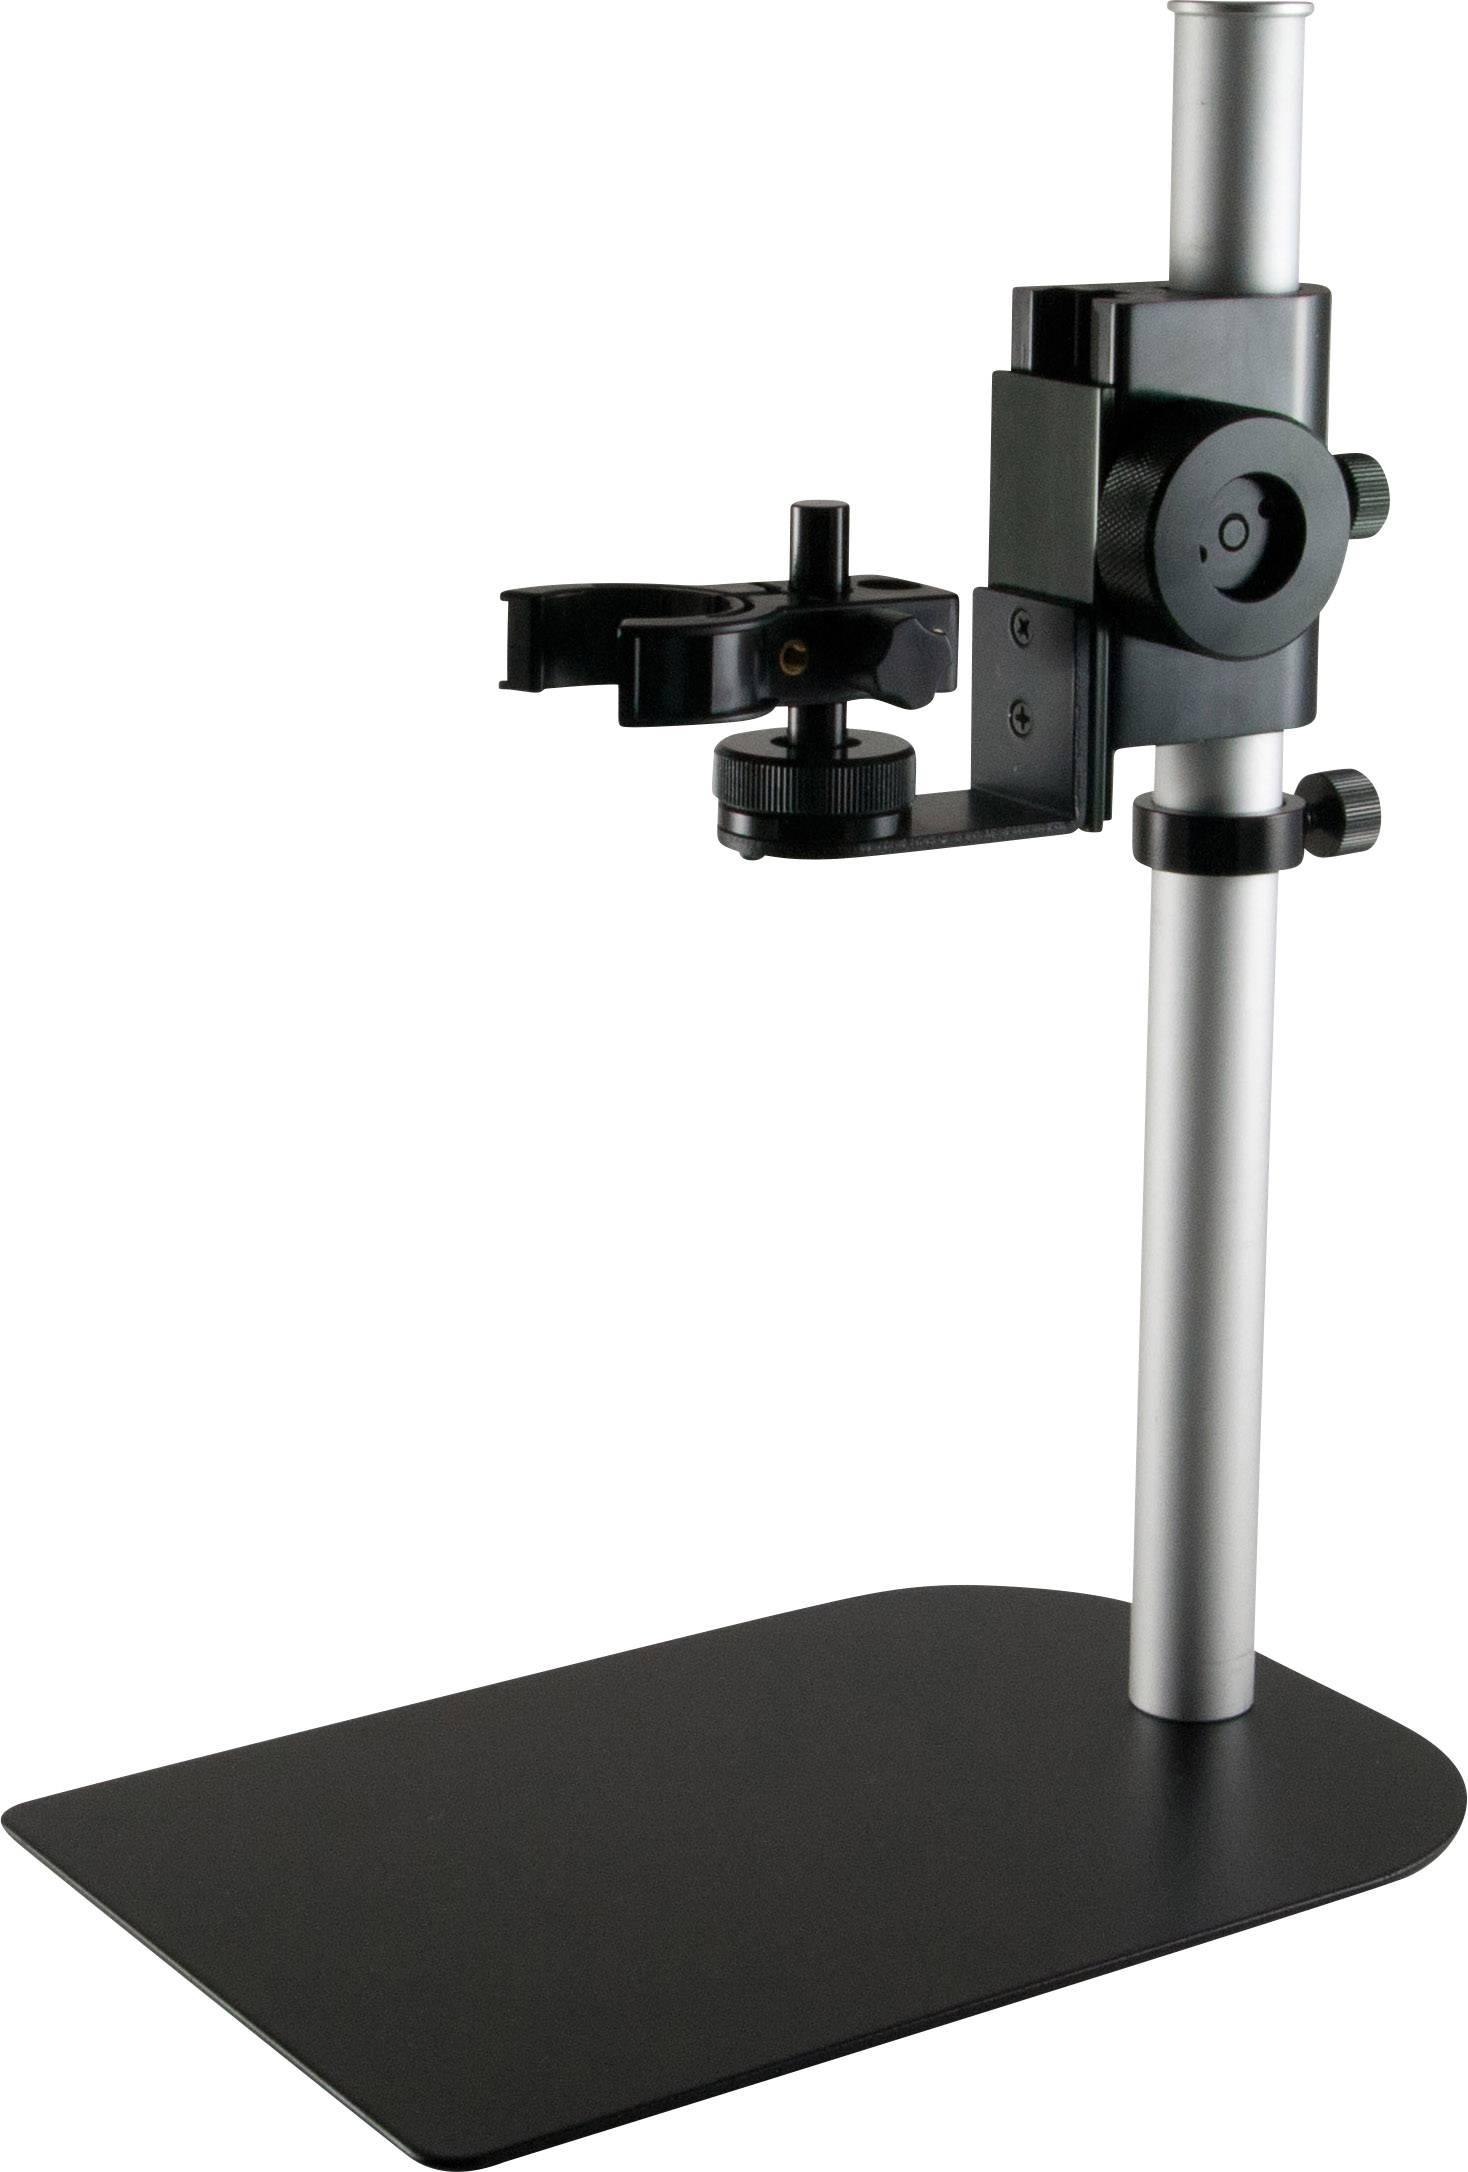 USB mikroskop Dino Lite MS35B MS35B